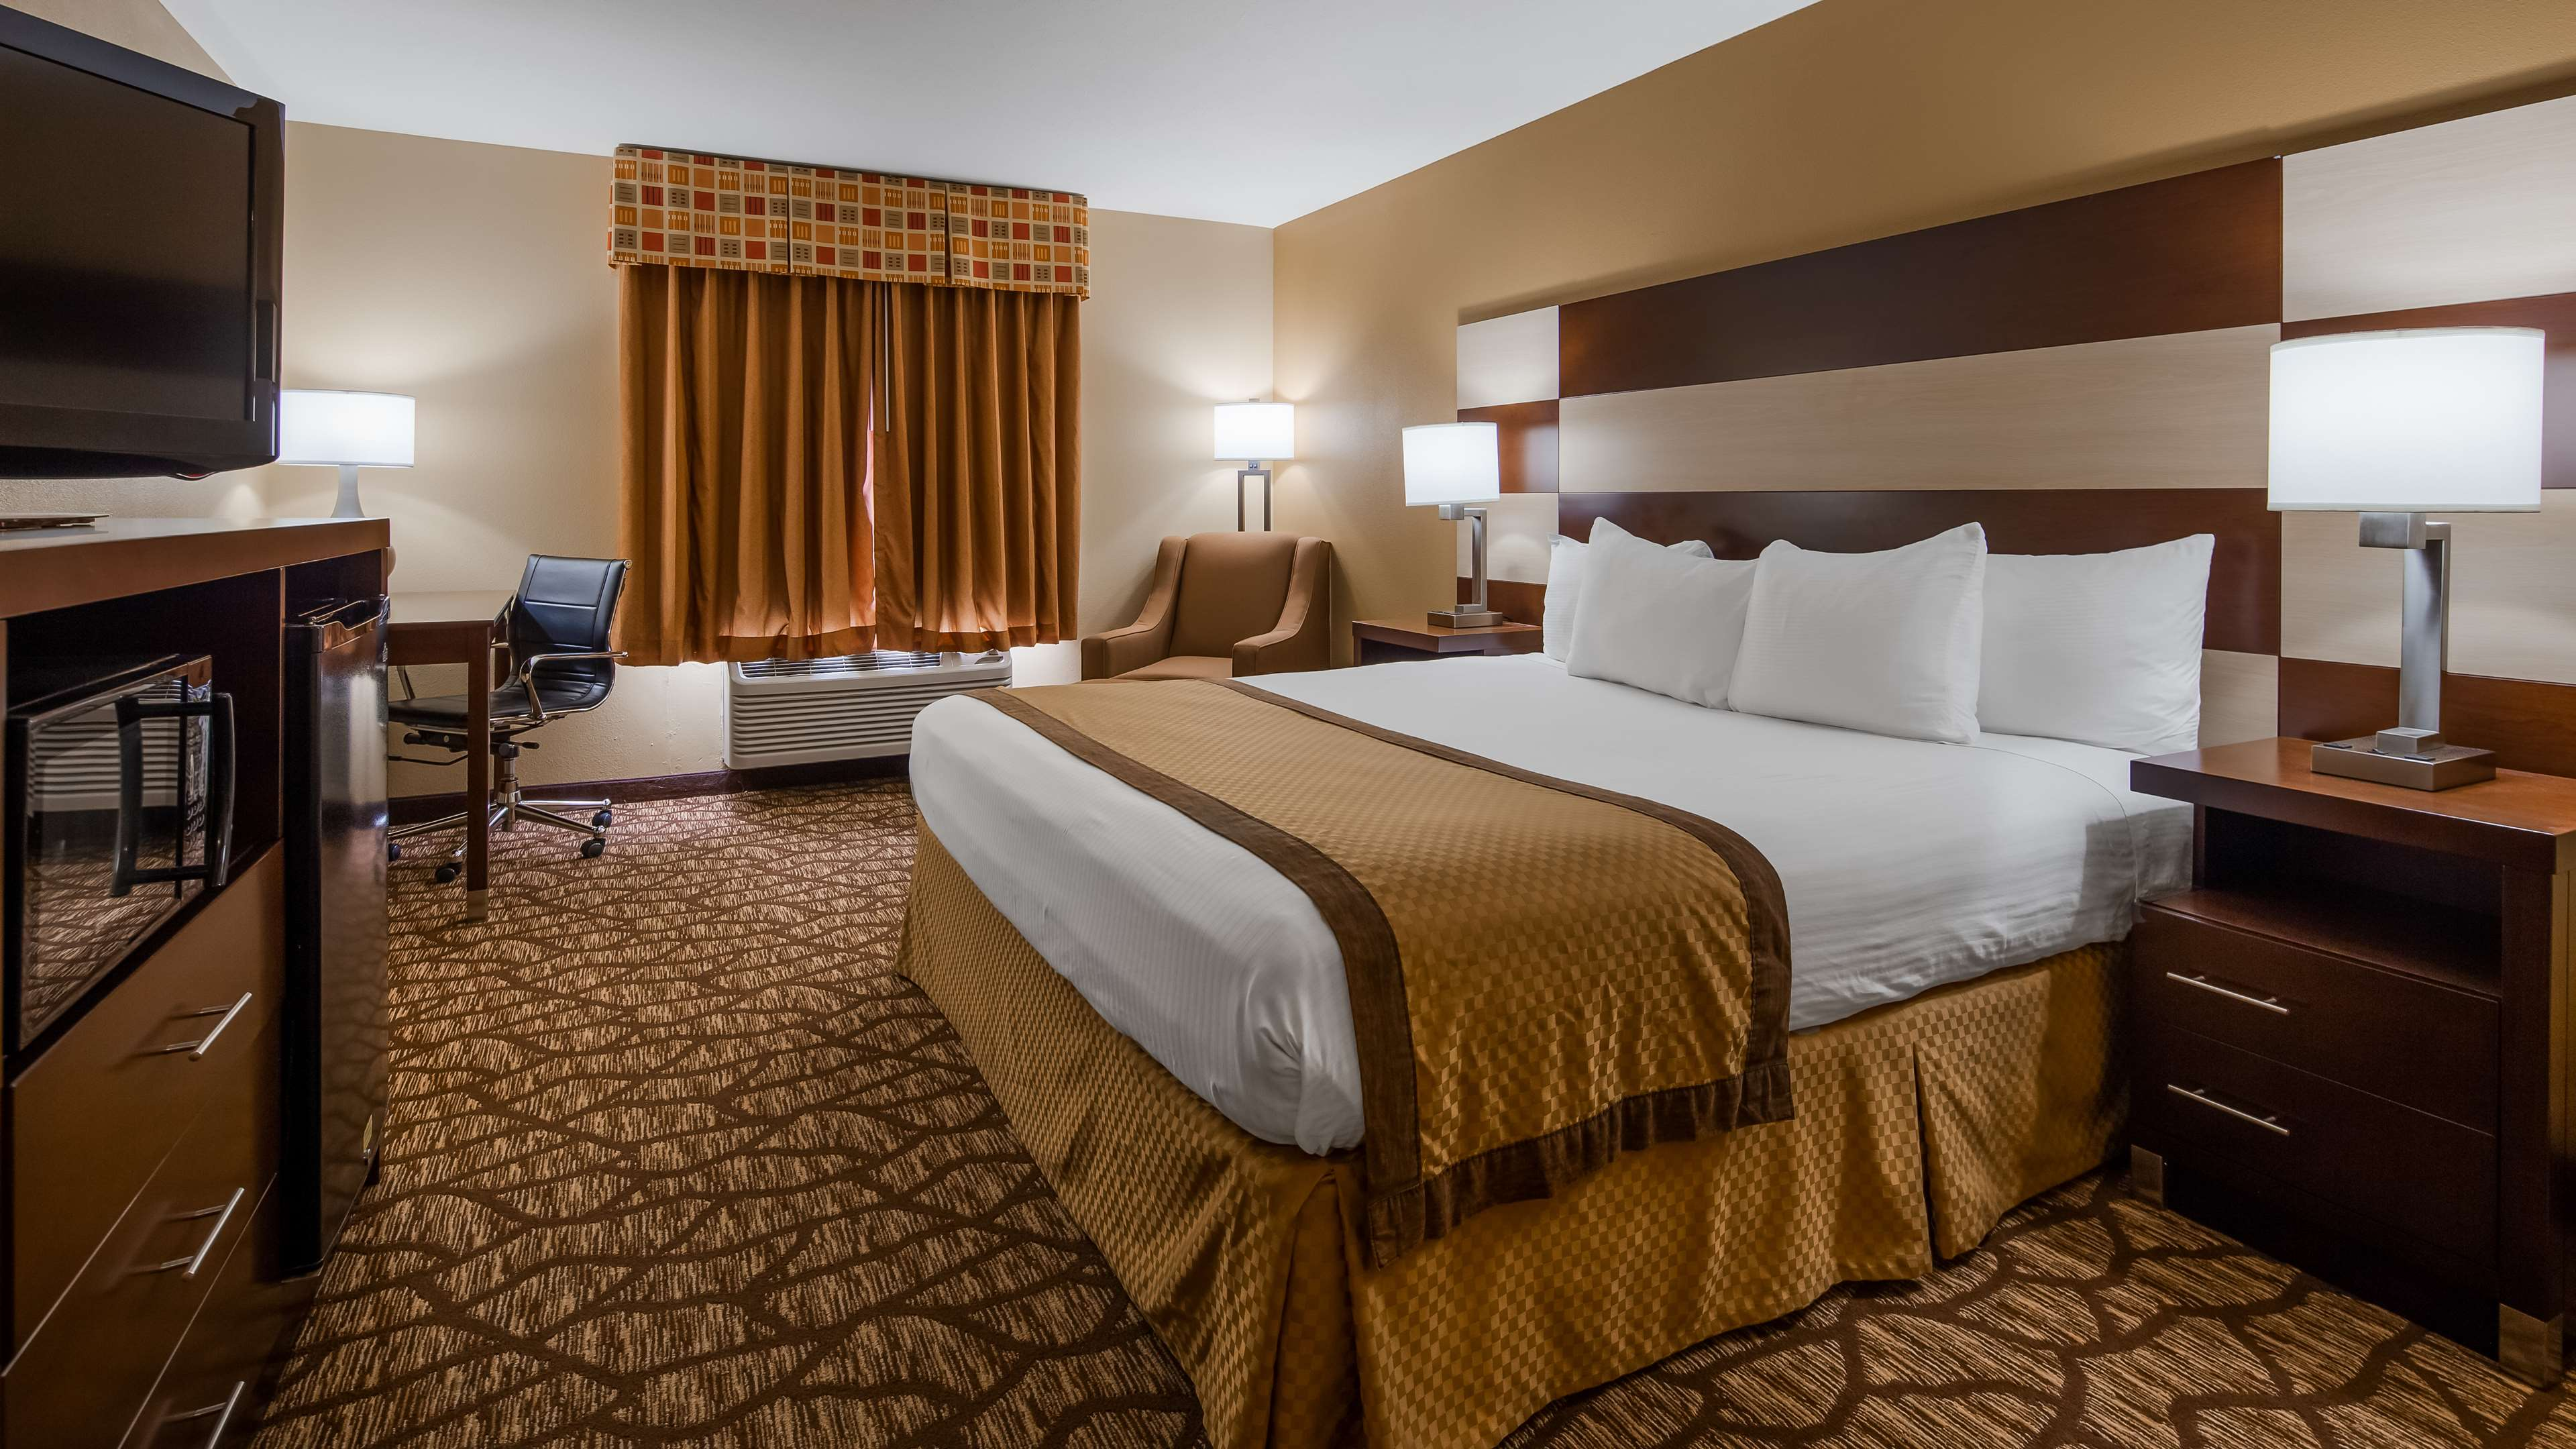 Best Western Joliet Inn & Suites image 10